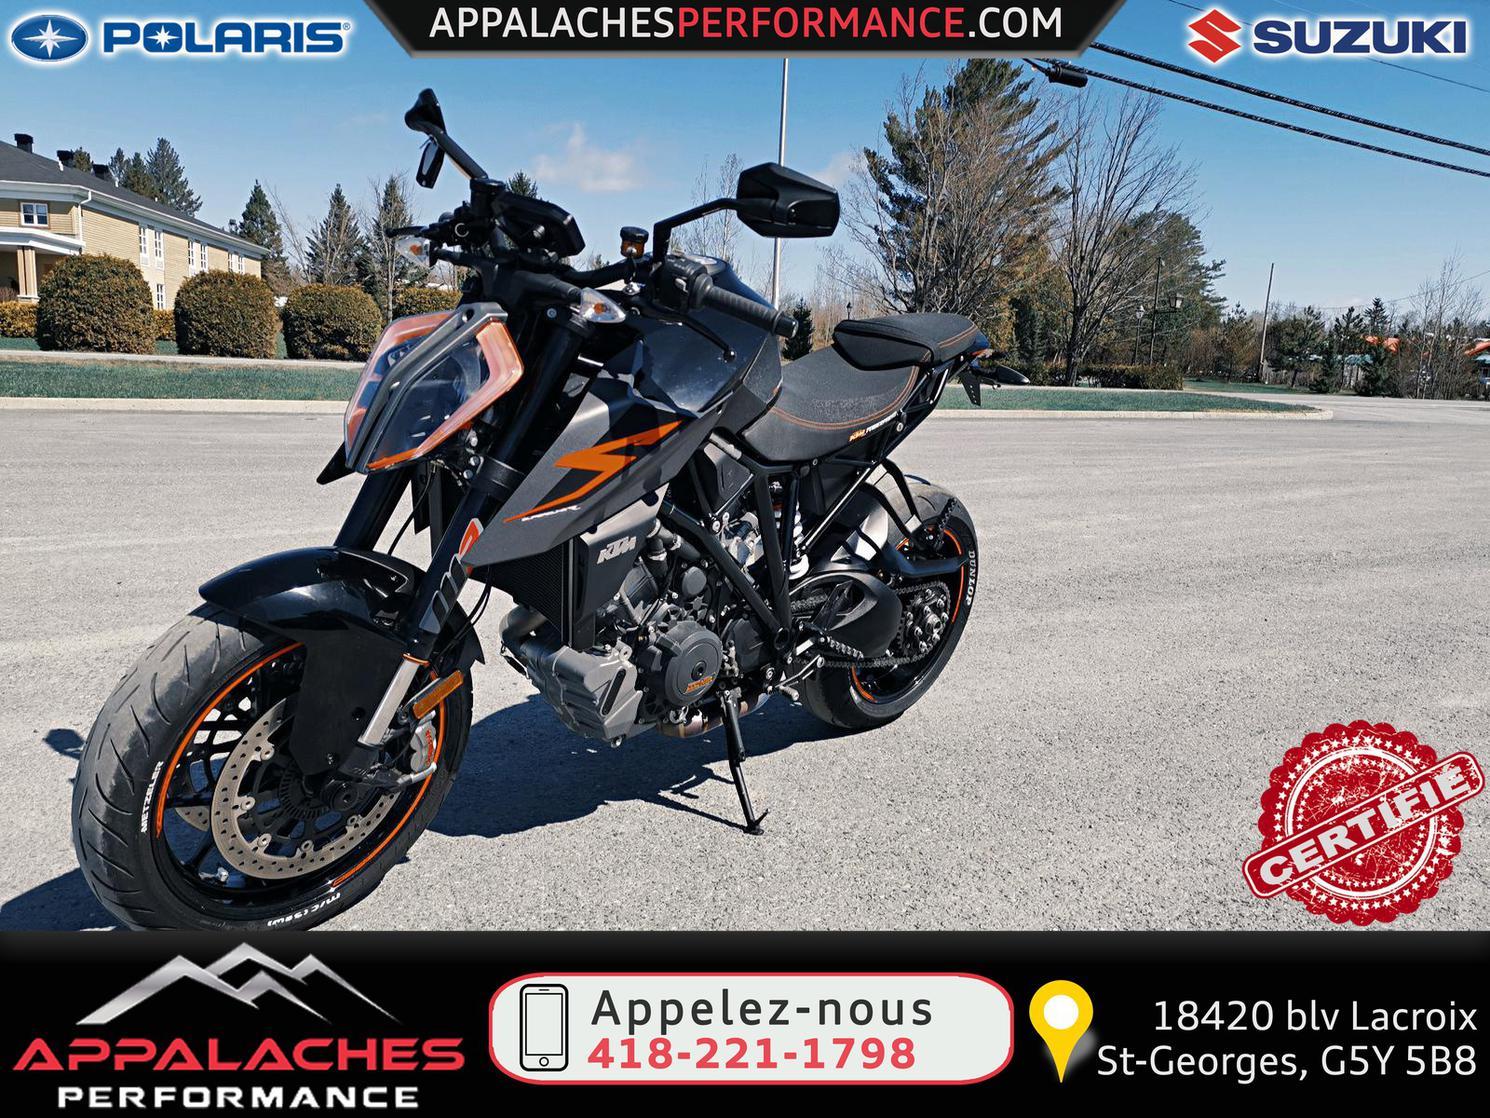 2018 KTM SUPER DUKE 1290 R